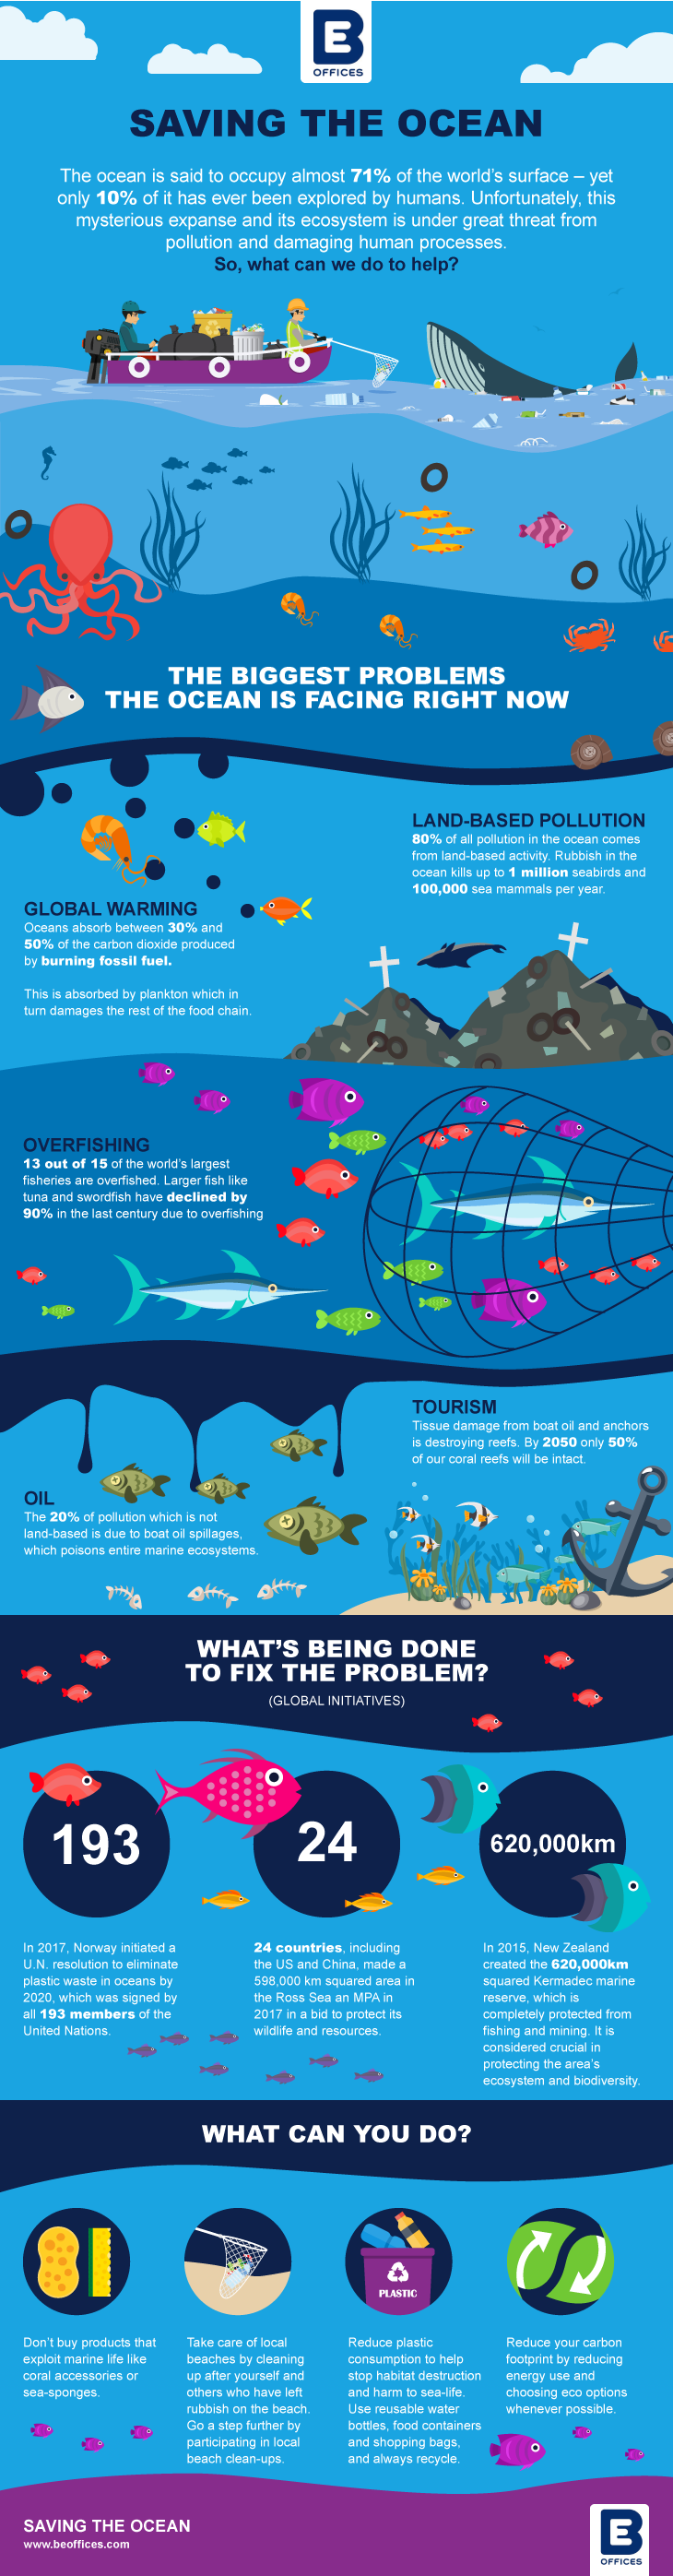 Saving the ocean on World Oceans Day